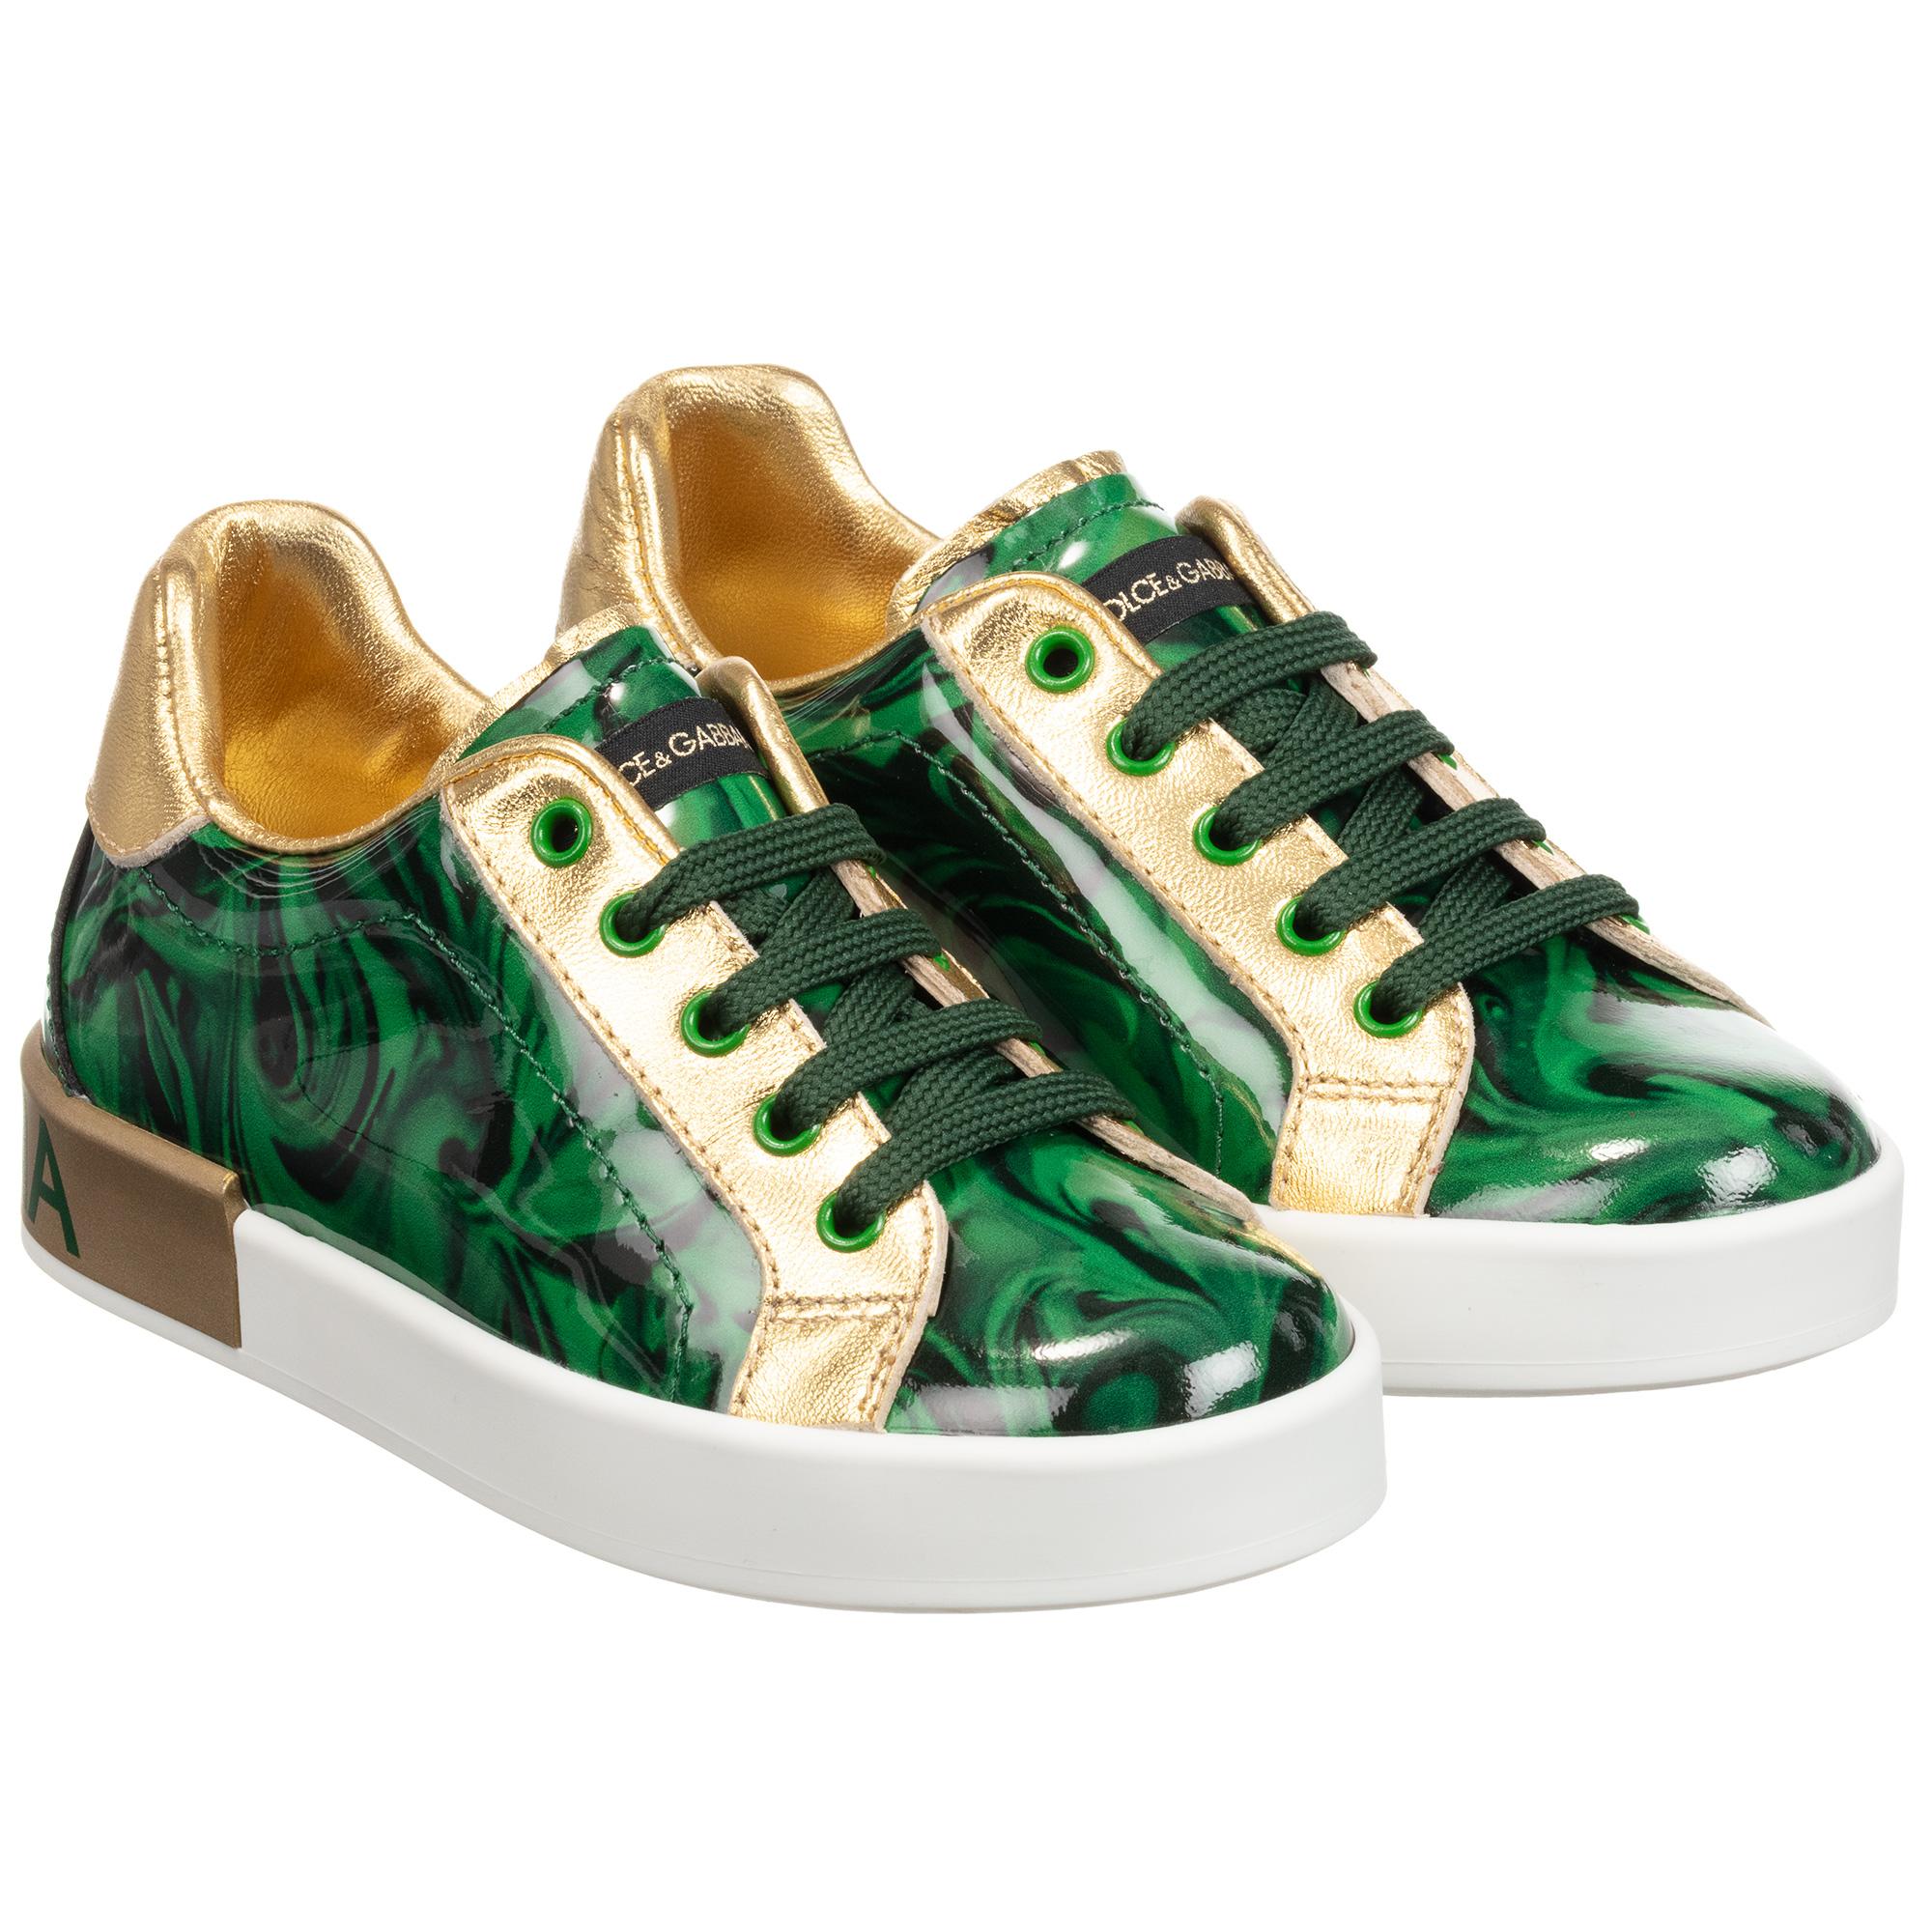 Dolce \u0026 Gabbana - Green \u0026 Gold Leather